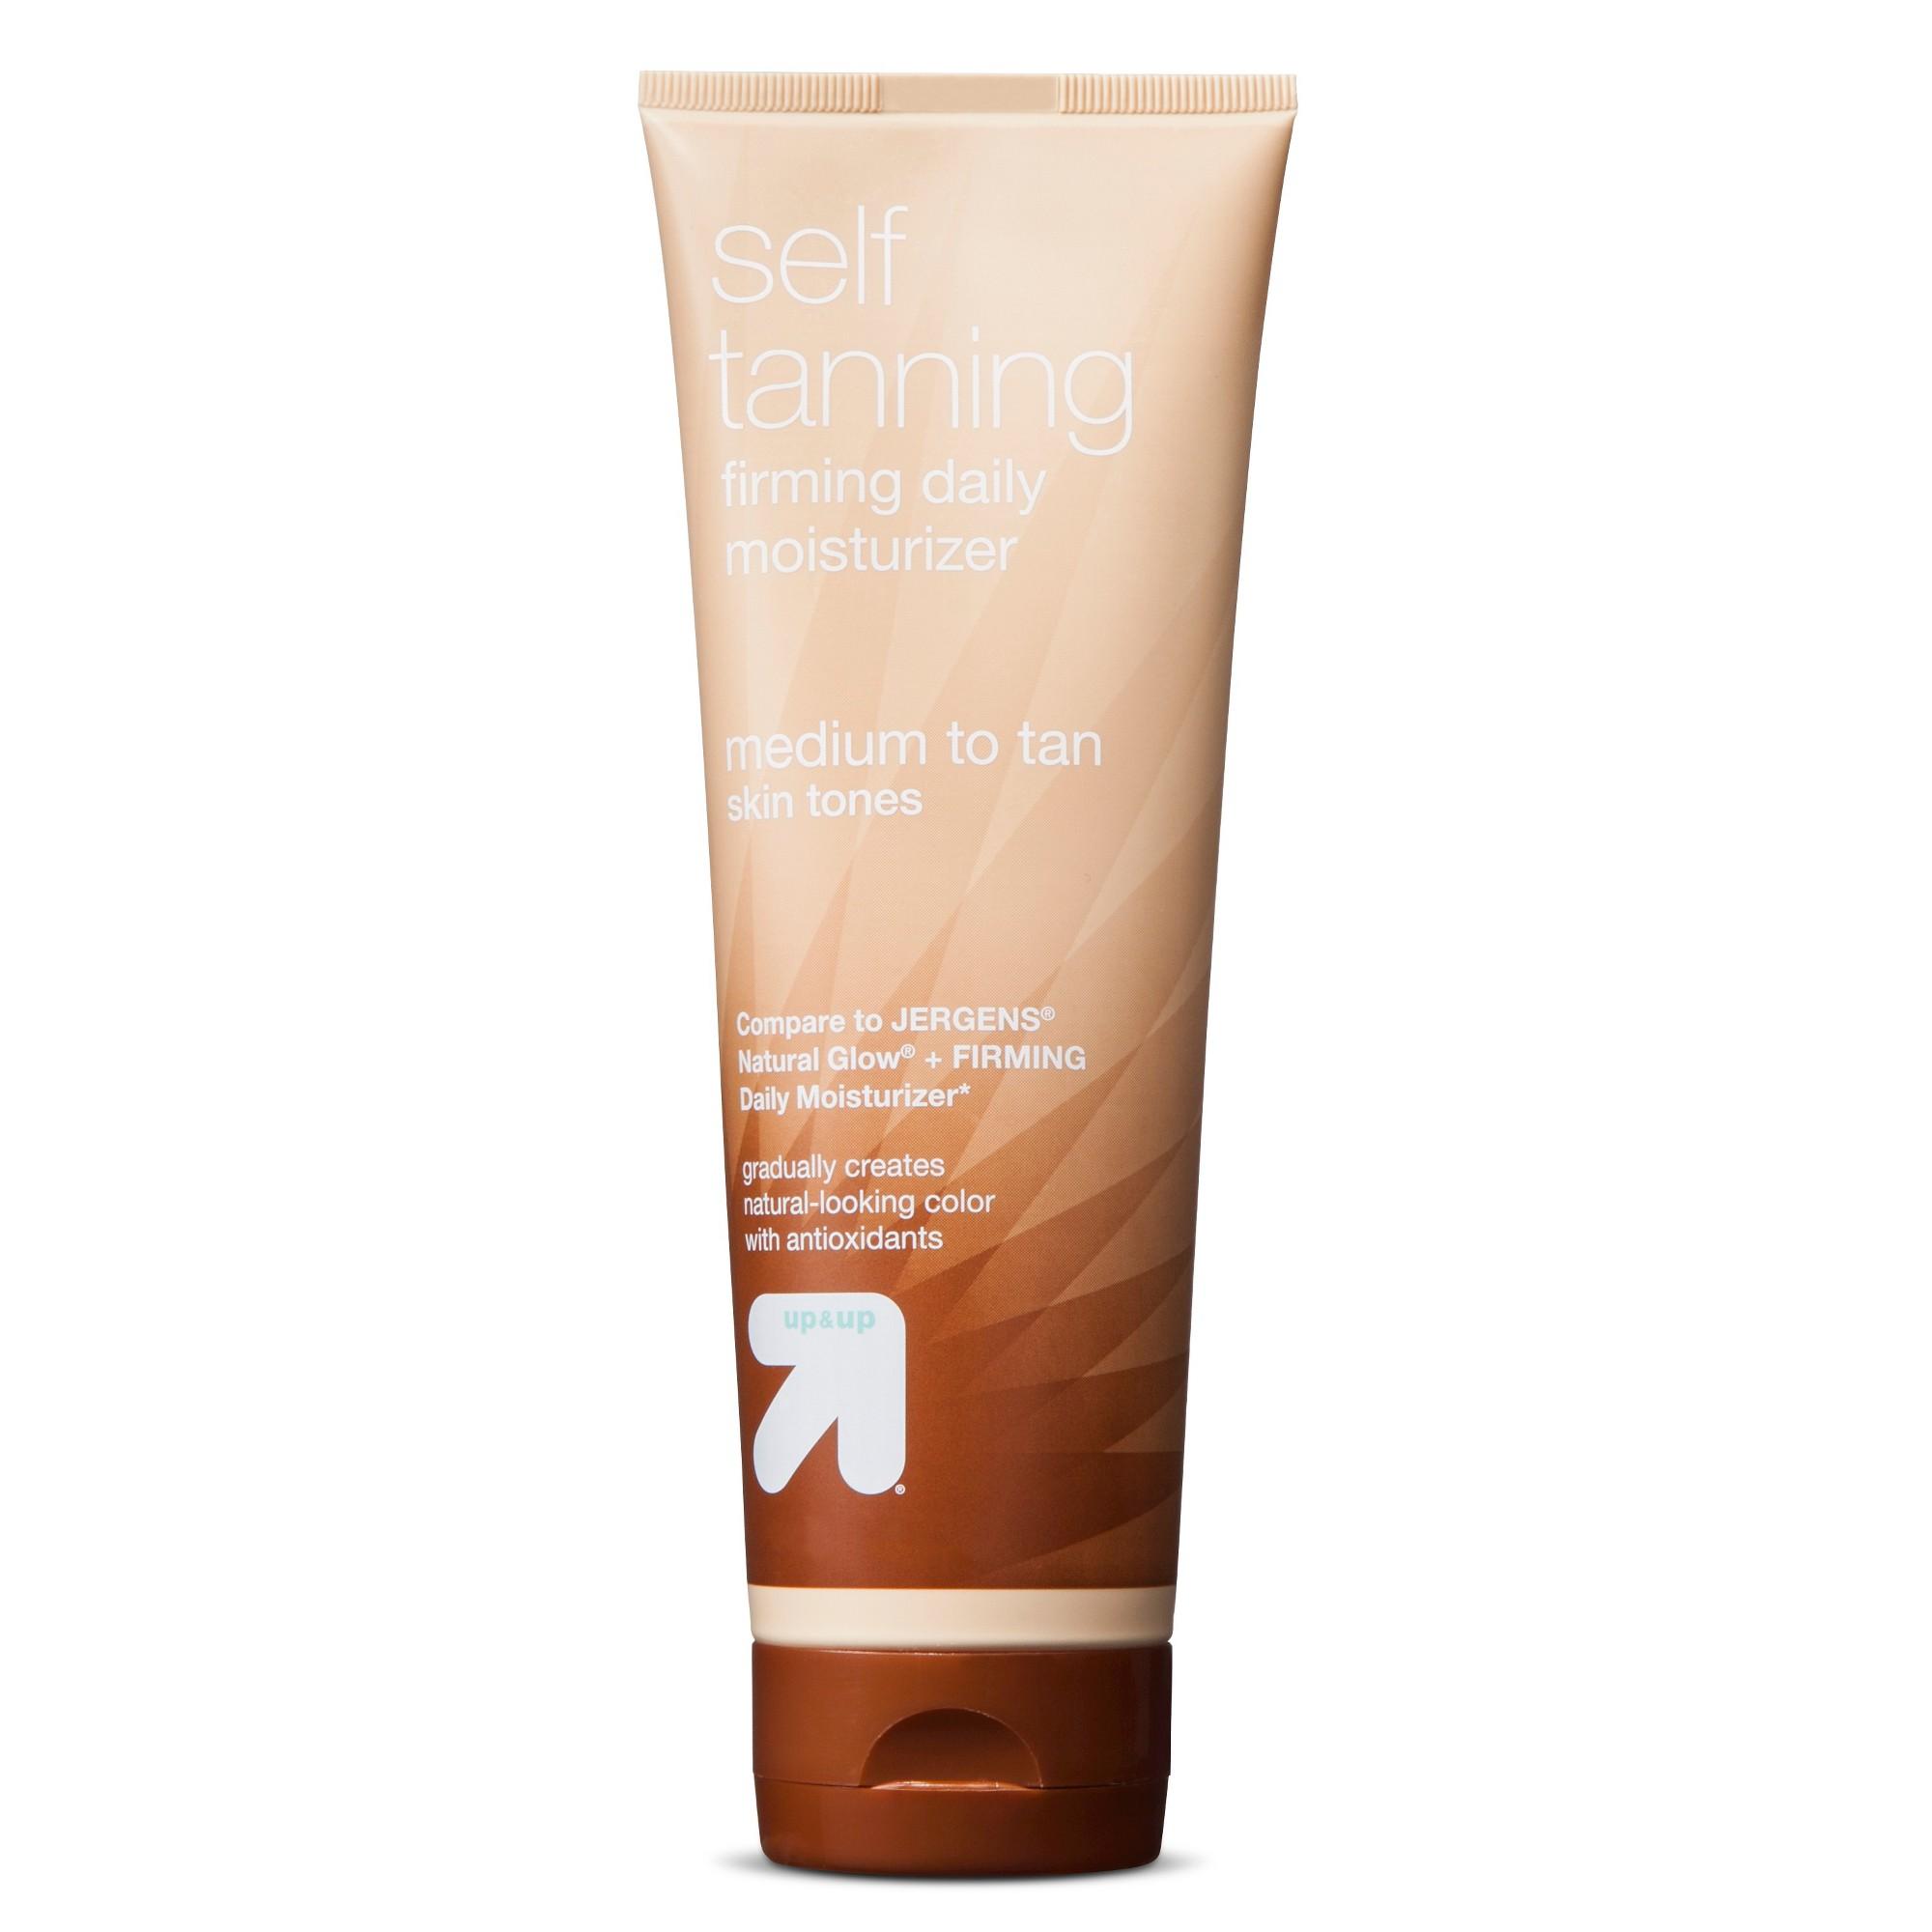 Natural Glow Daily Moisturizer Medium to Tan Skin Tones 7